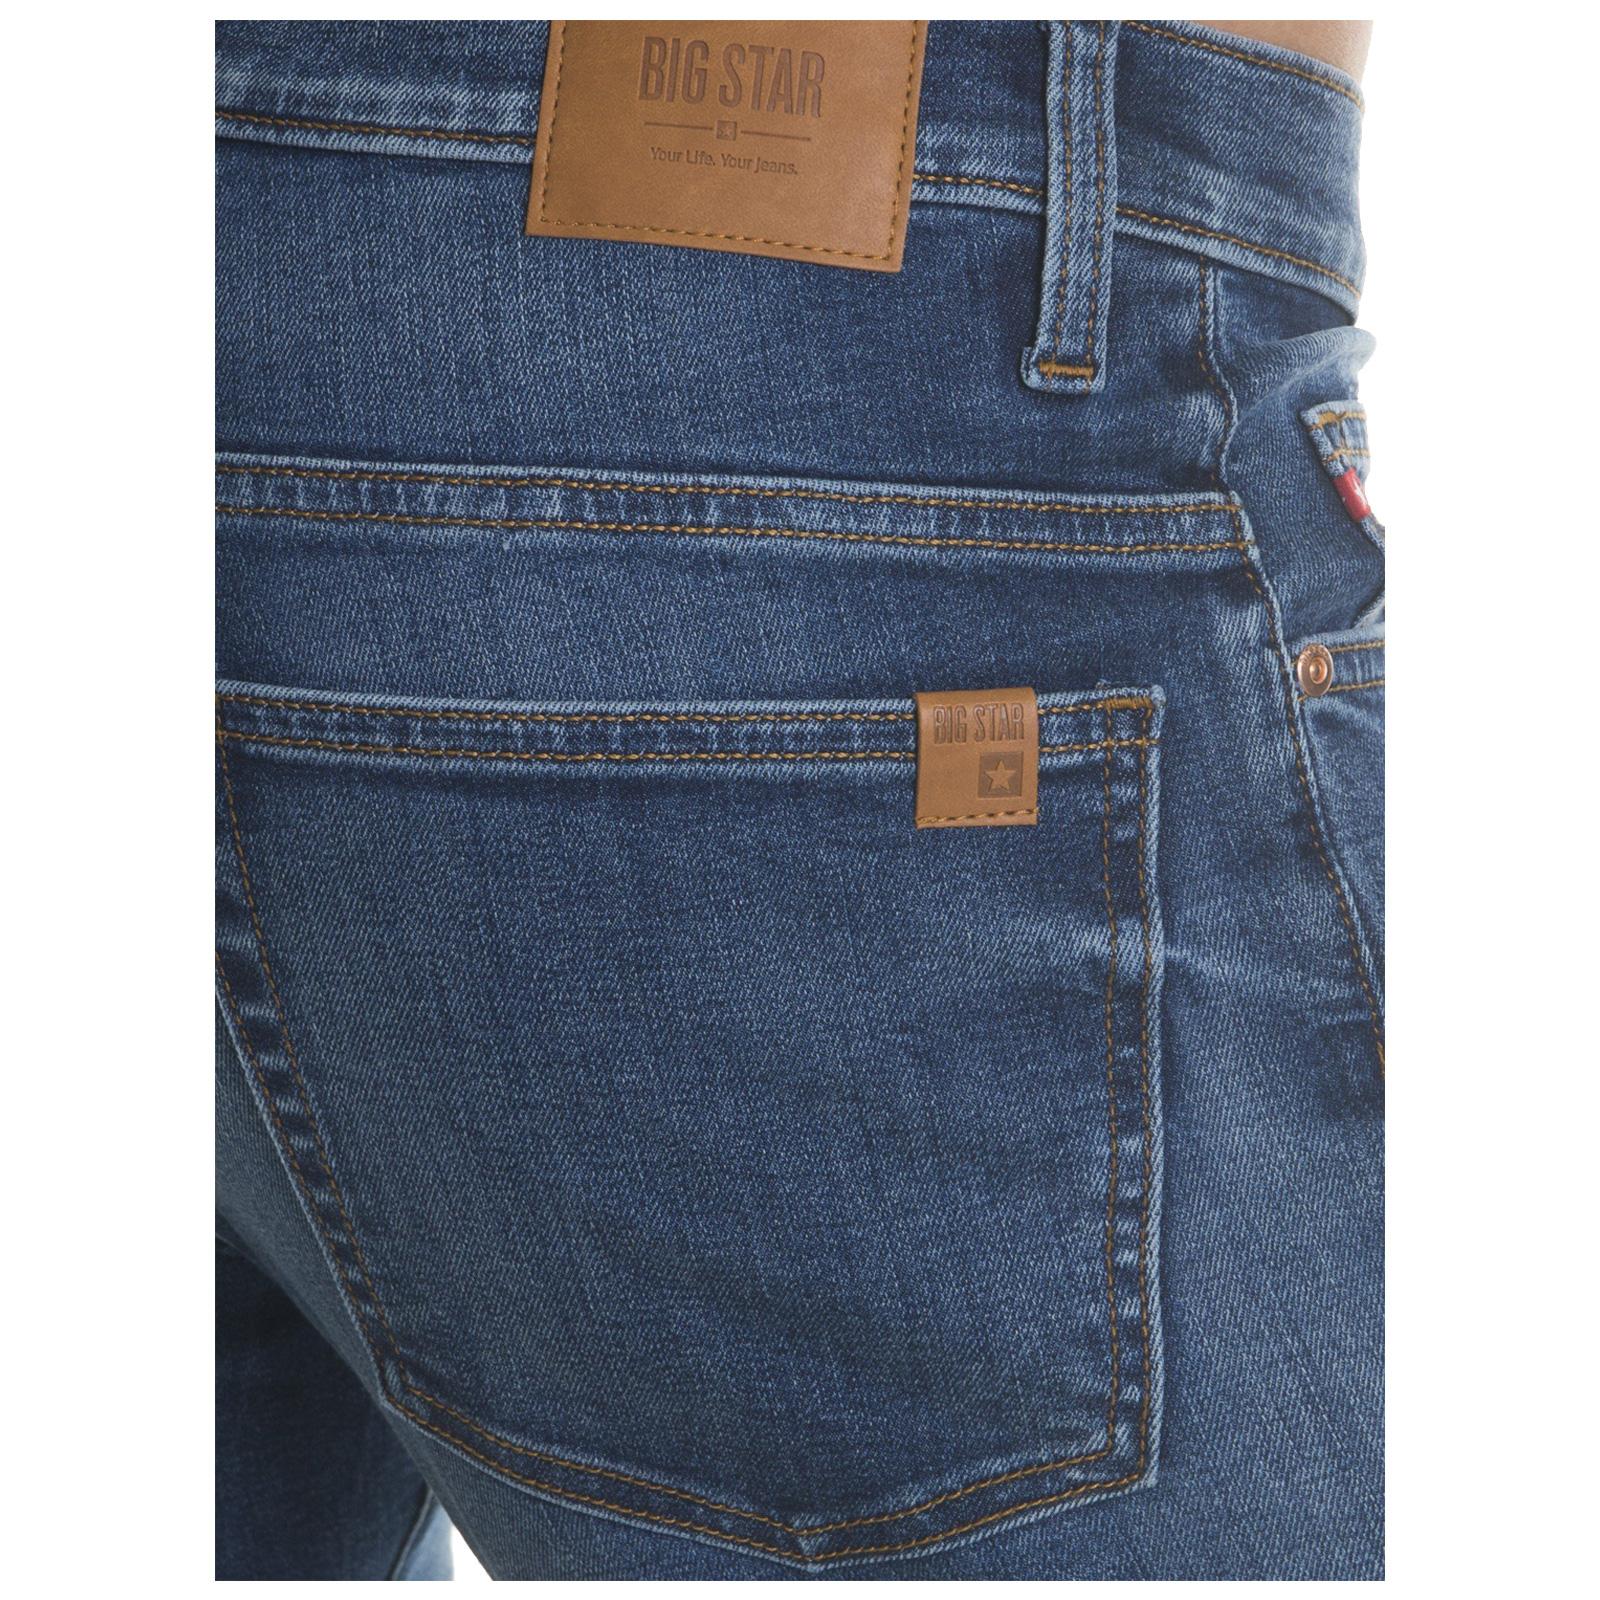 Big-Star-Mens-Denim-Jeans-Straight-Tapered-Leg-Style-Designer-Casual-Trousers thumbnail 13